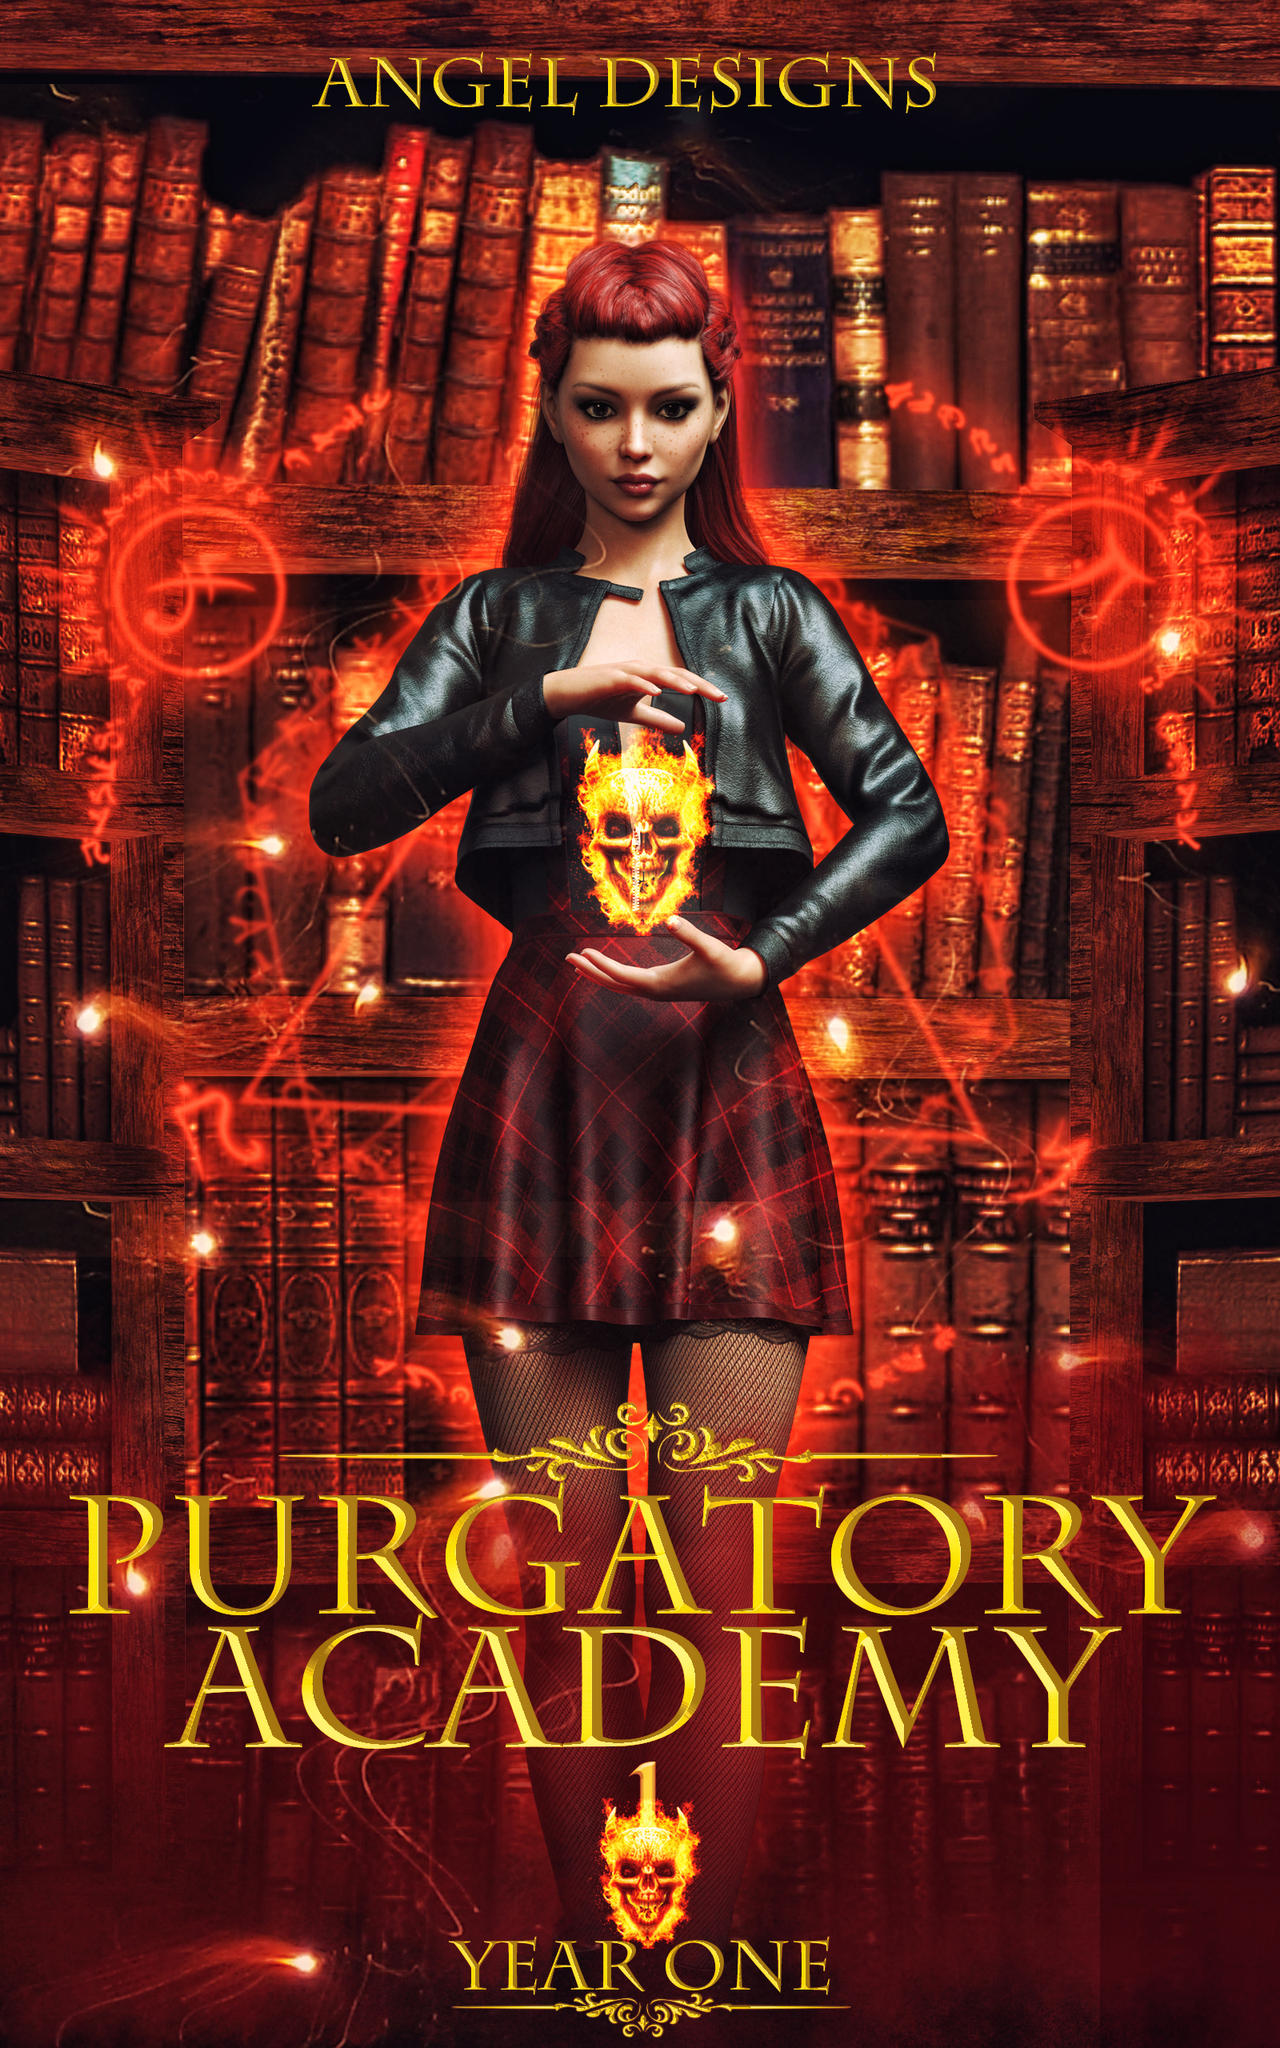 Purgatory academy